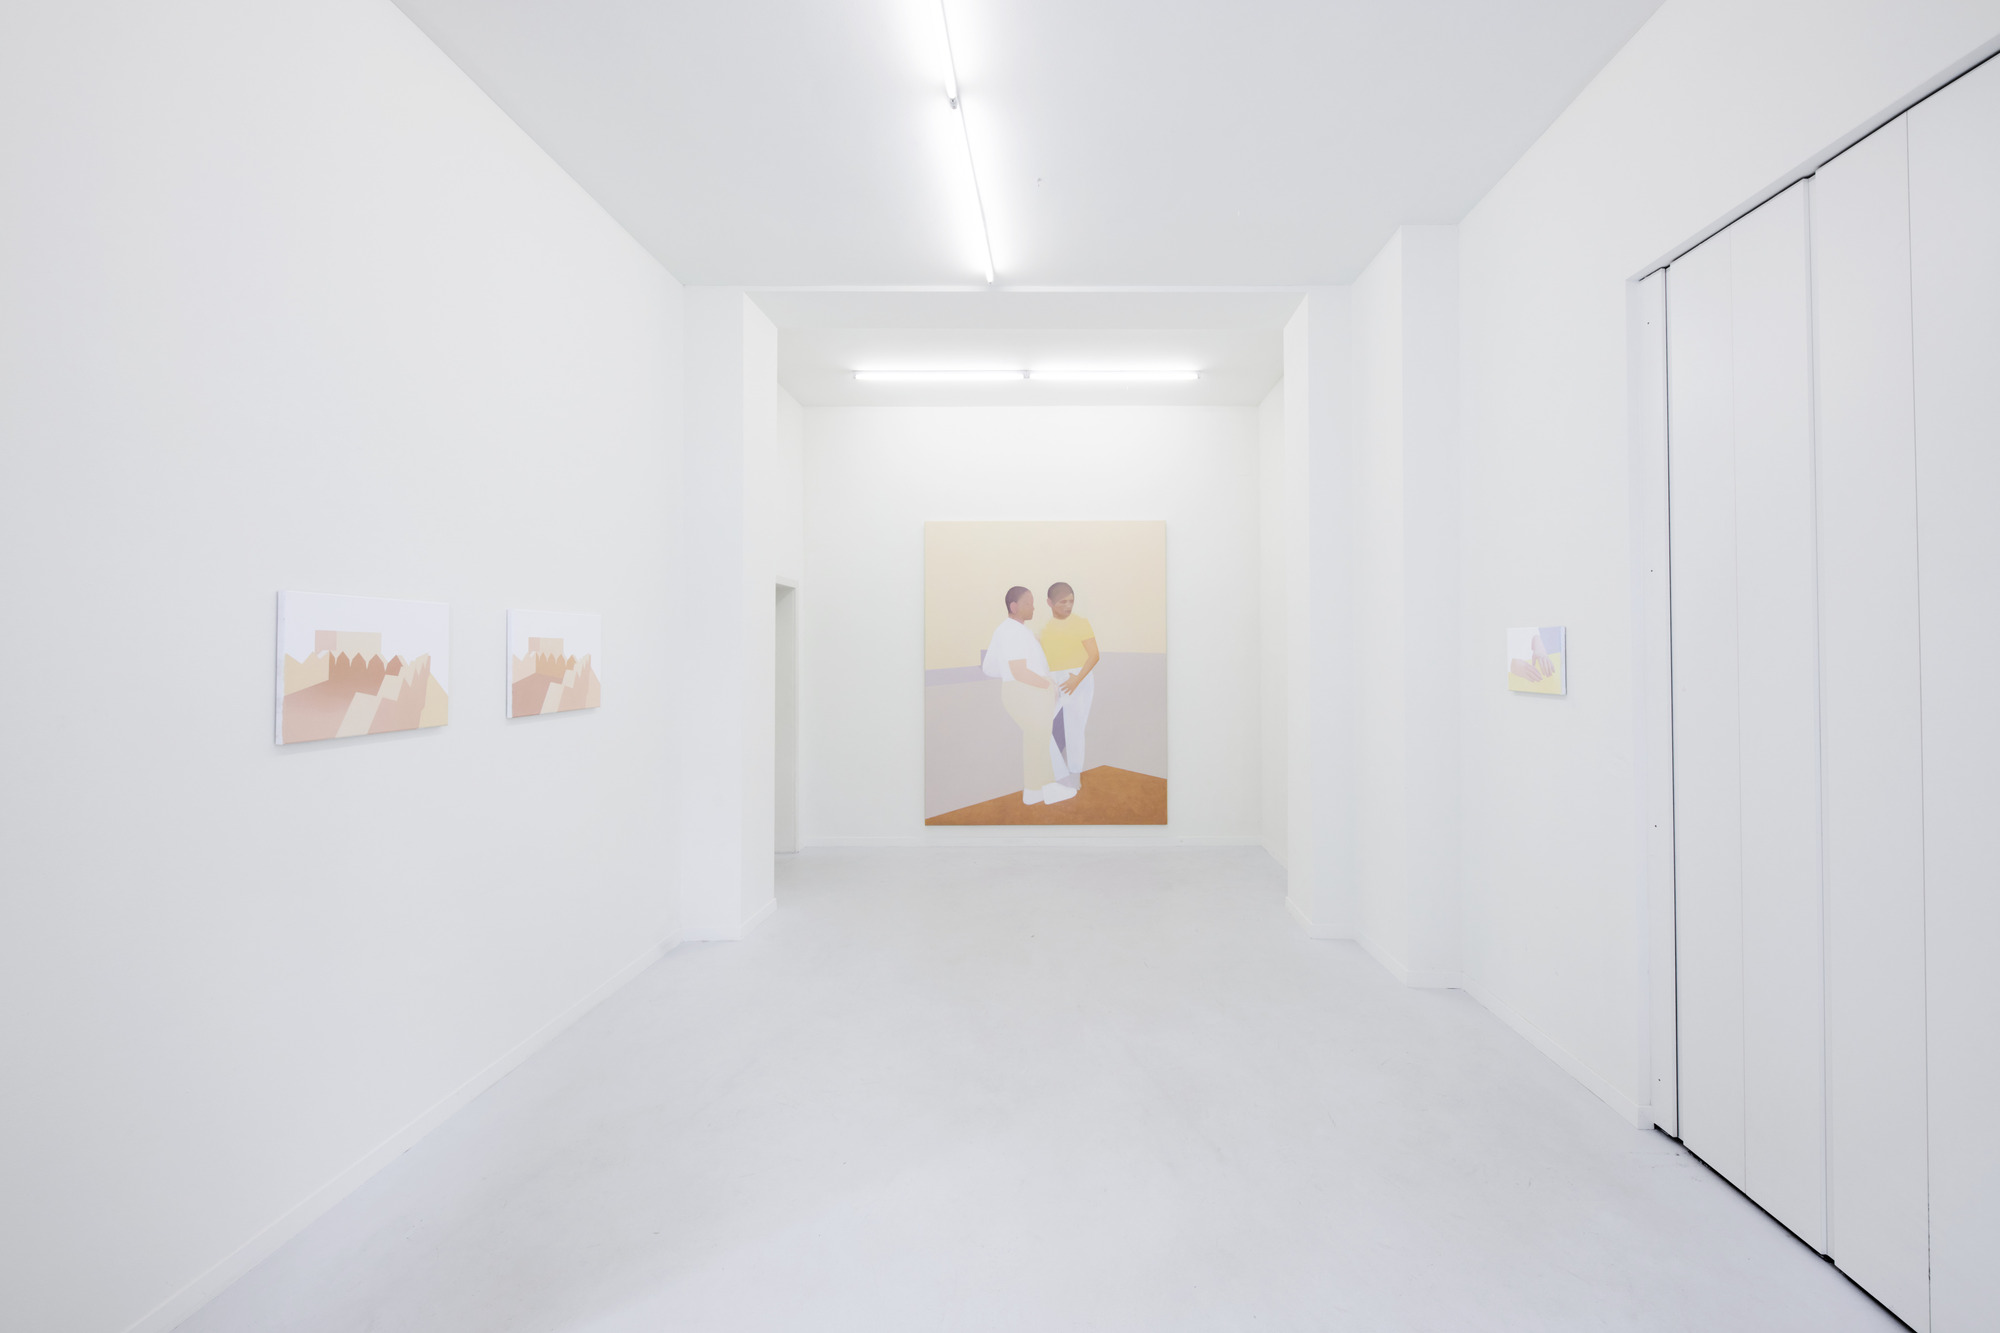 Manuel Stehli untitled (Mauer I, Mauer II), 2020, 2×24×28 cm, oil on canvas & untitled, 2020, 240×190 cm, oil on canvas & untitled (Händepaar II), 2020, 24×28 cm, oil on canvas, Courtesy of the artist and Lemoyne